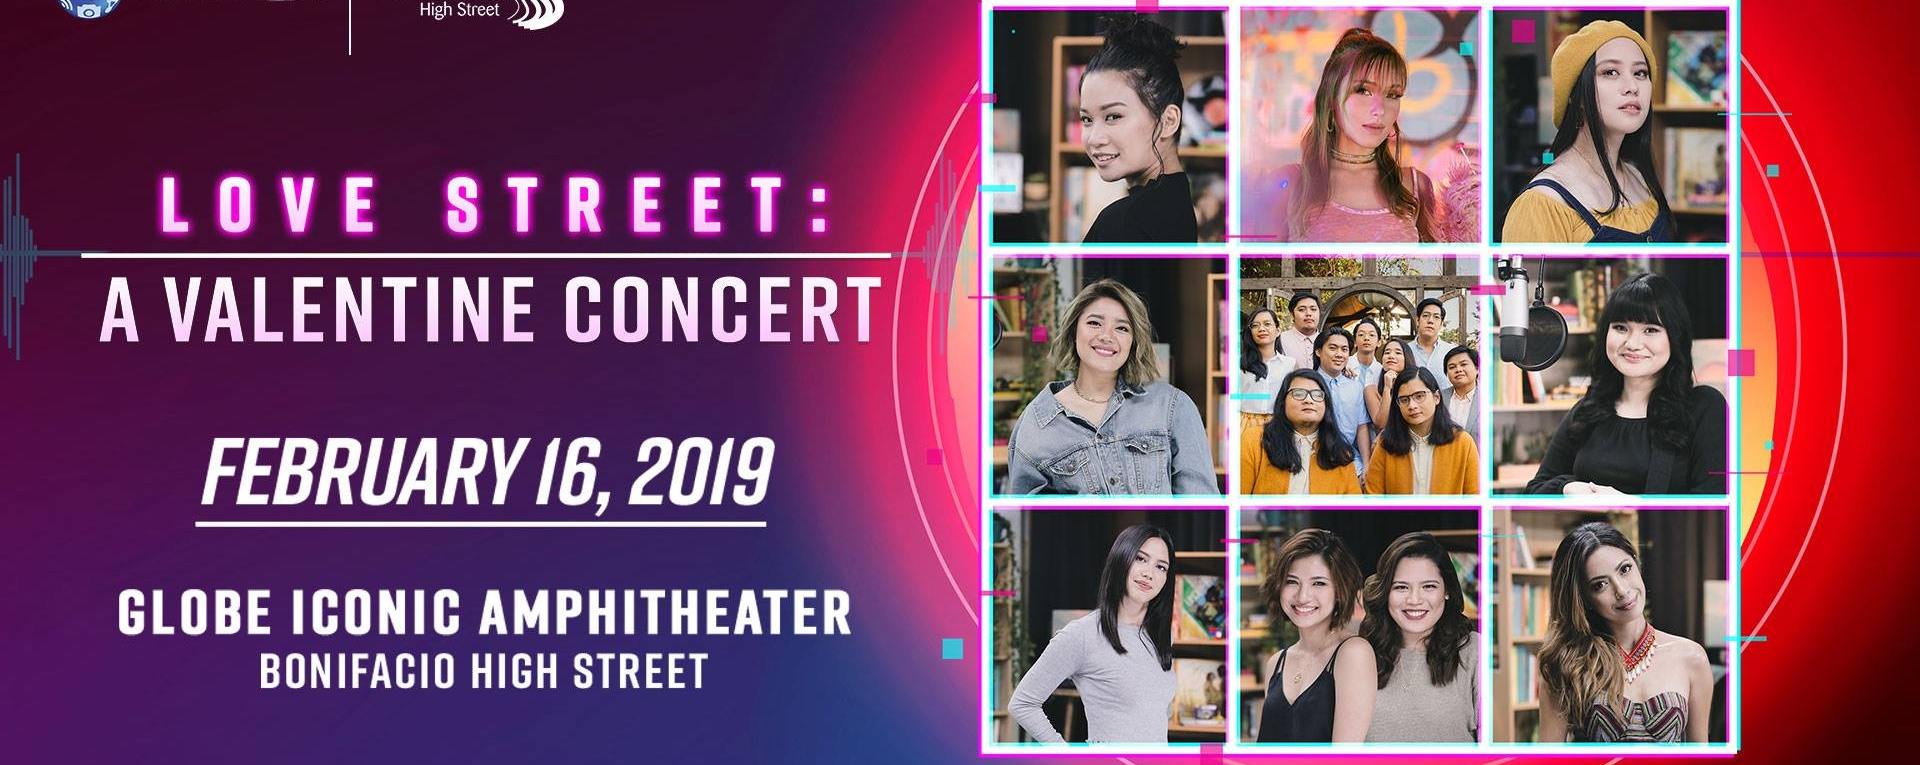 Love Street: A Valentine Concert